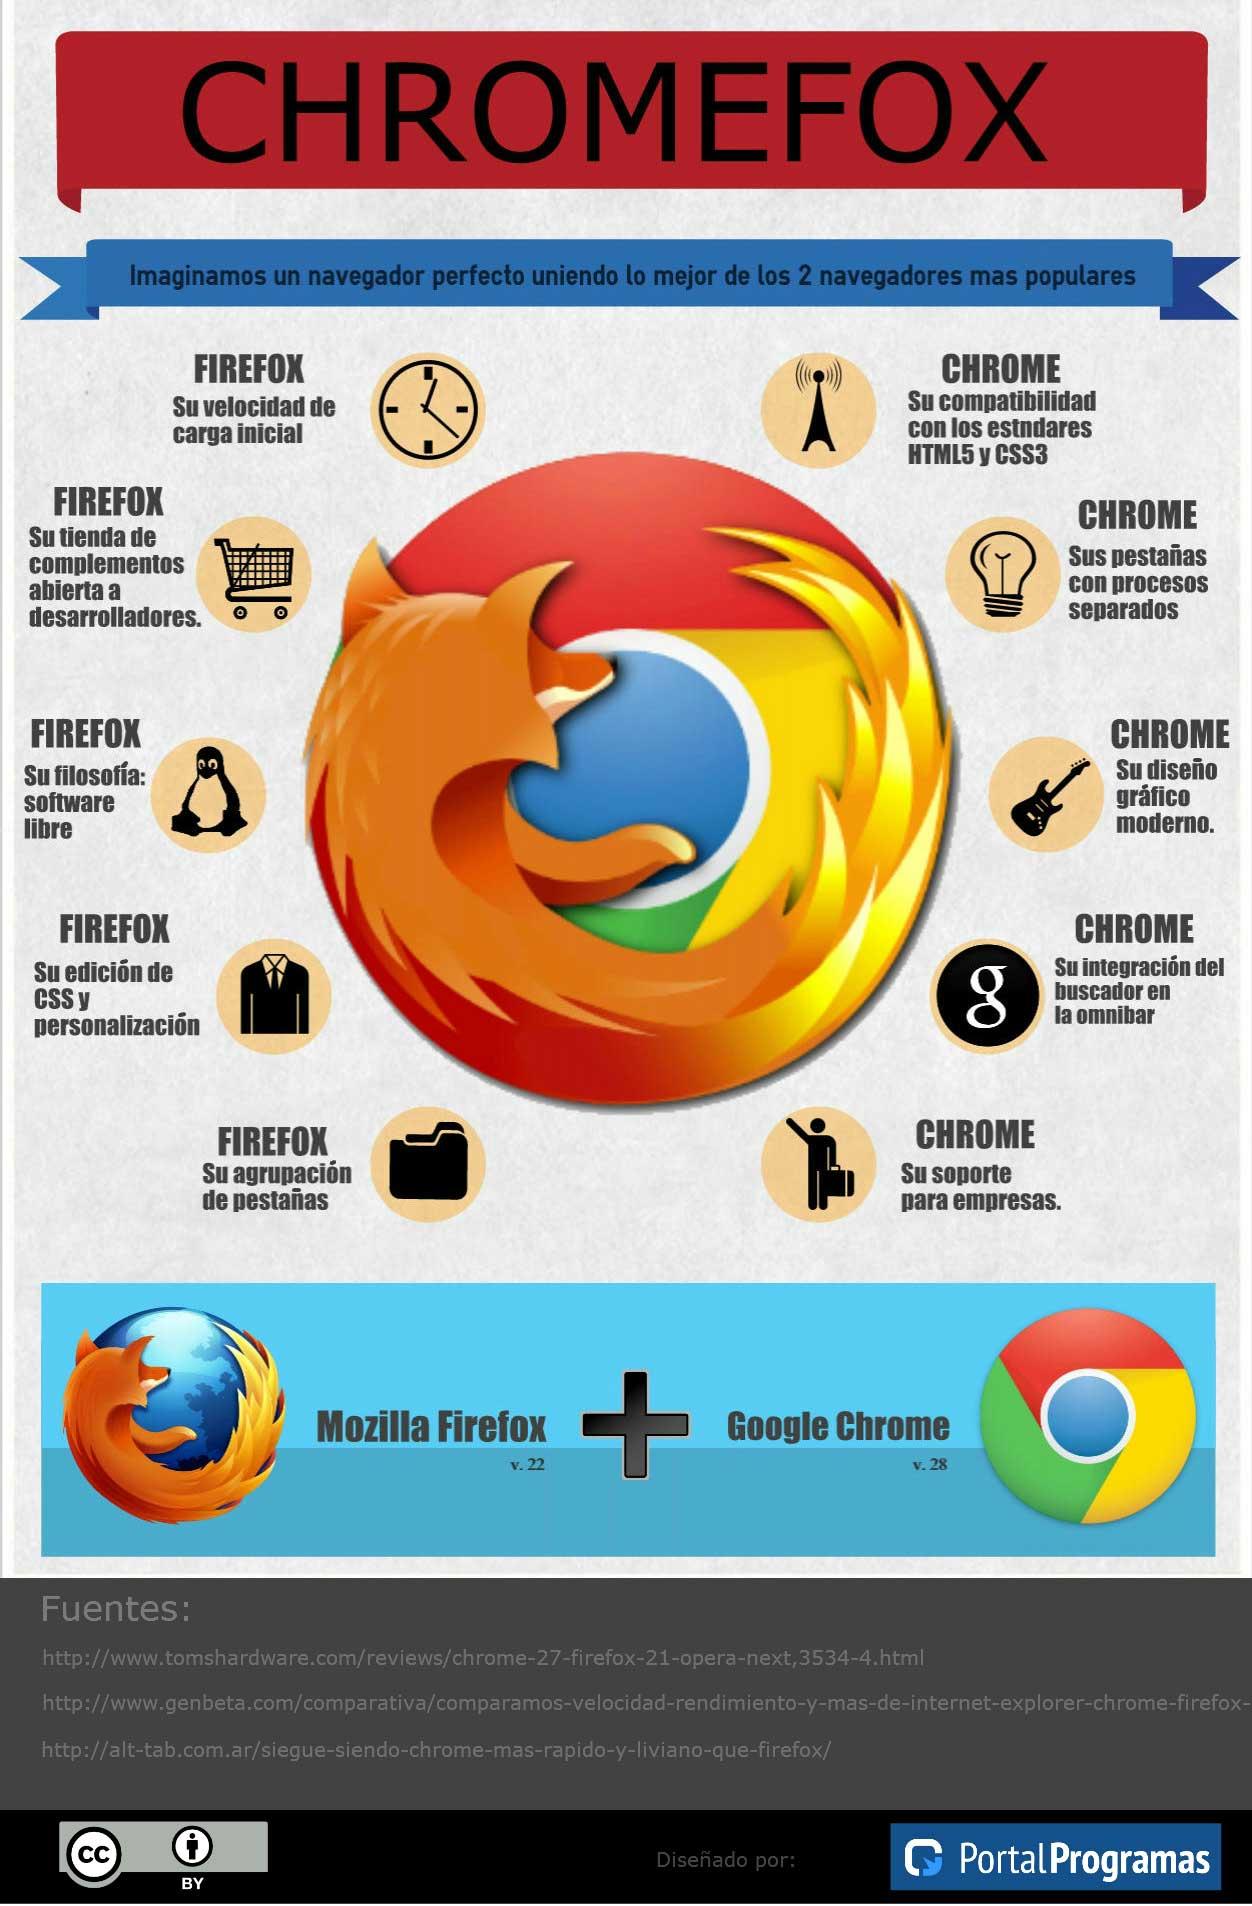 ChromeFox: el navegador definitivo